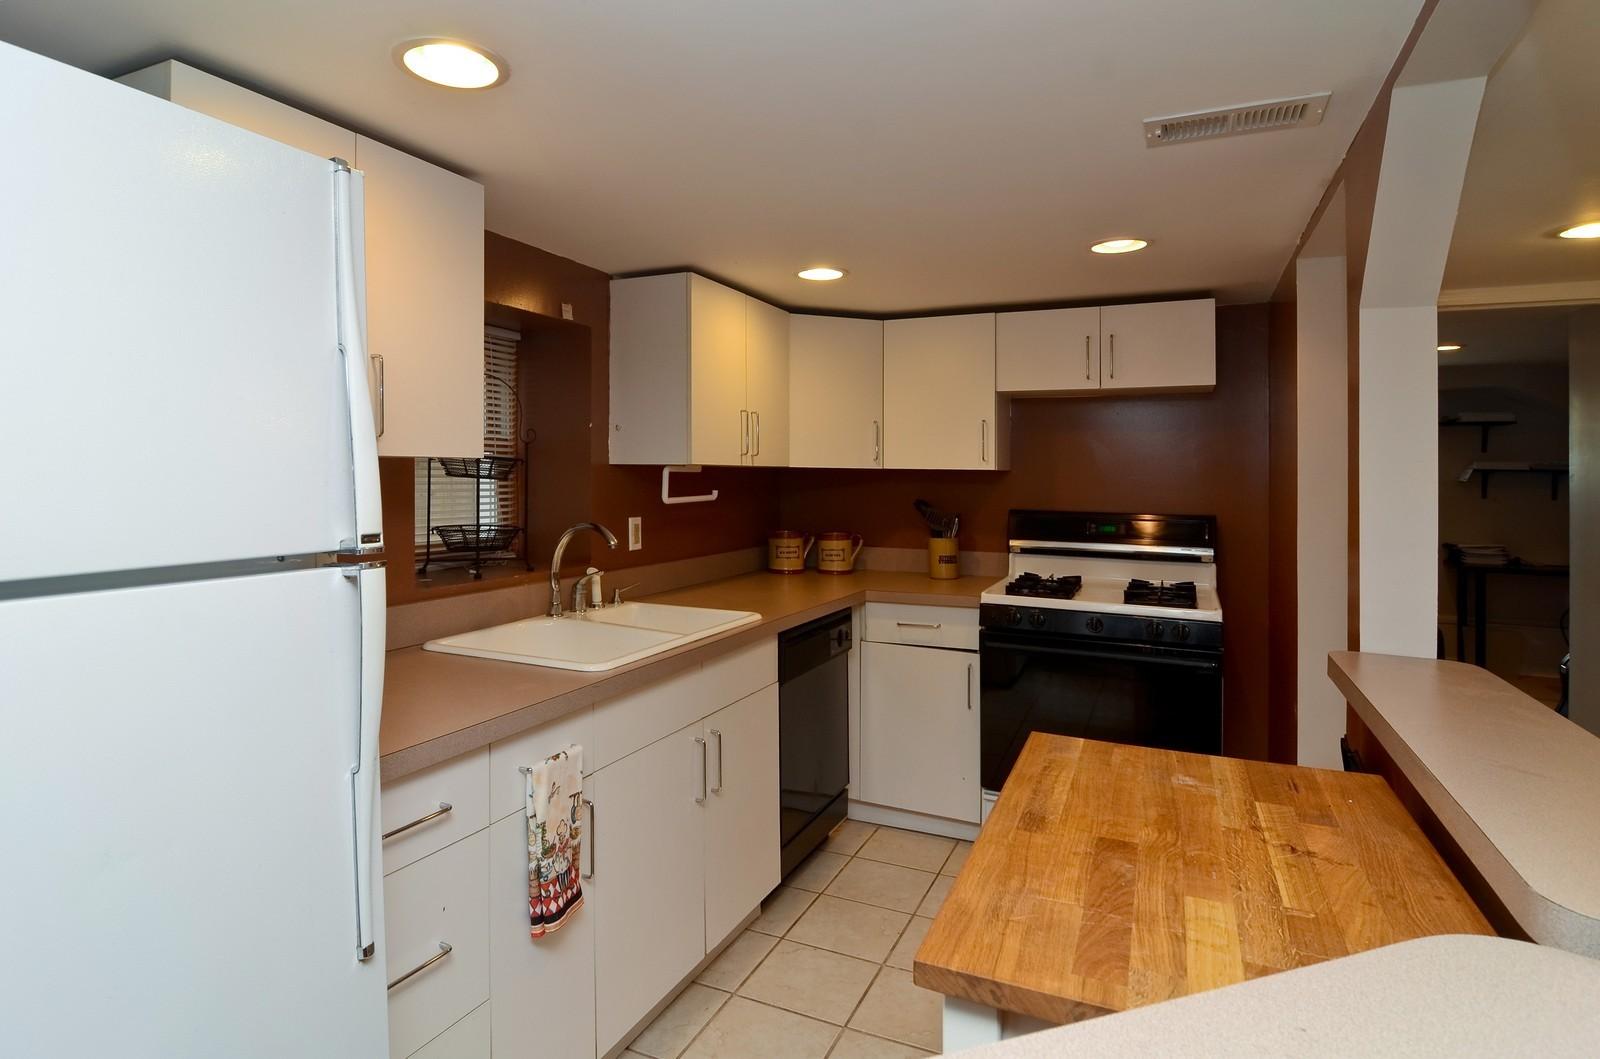 Real Estate Photography - 3525 W Wollfram, Chicago, IL, 60618 - Kitchen